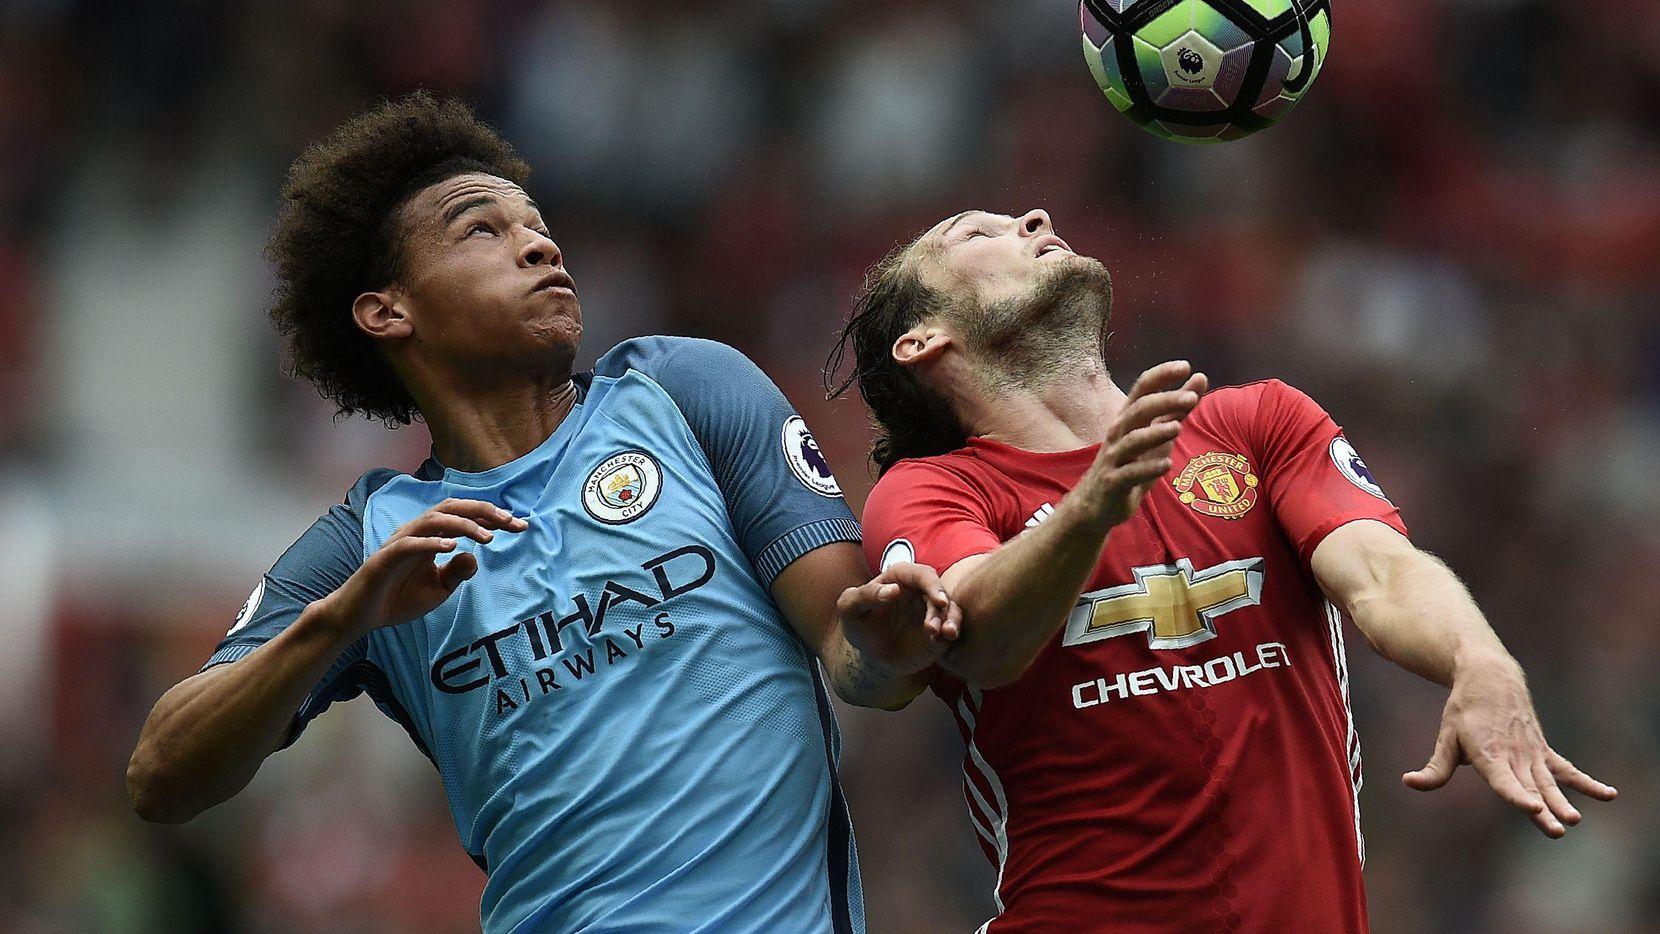 Leroy Sane (izq.) y el City enfrentan al United en el NRG Stadium. (AFP/Getty Images/OLI SCARFF)